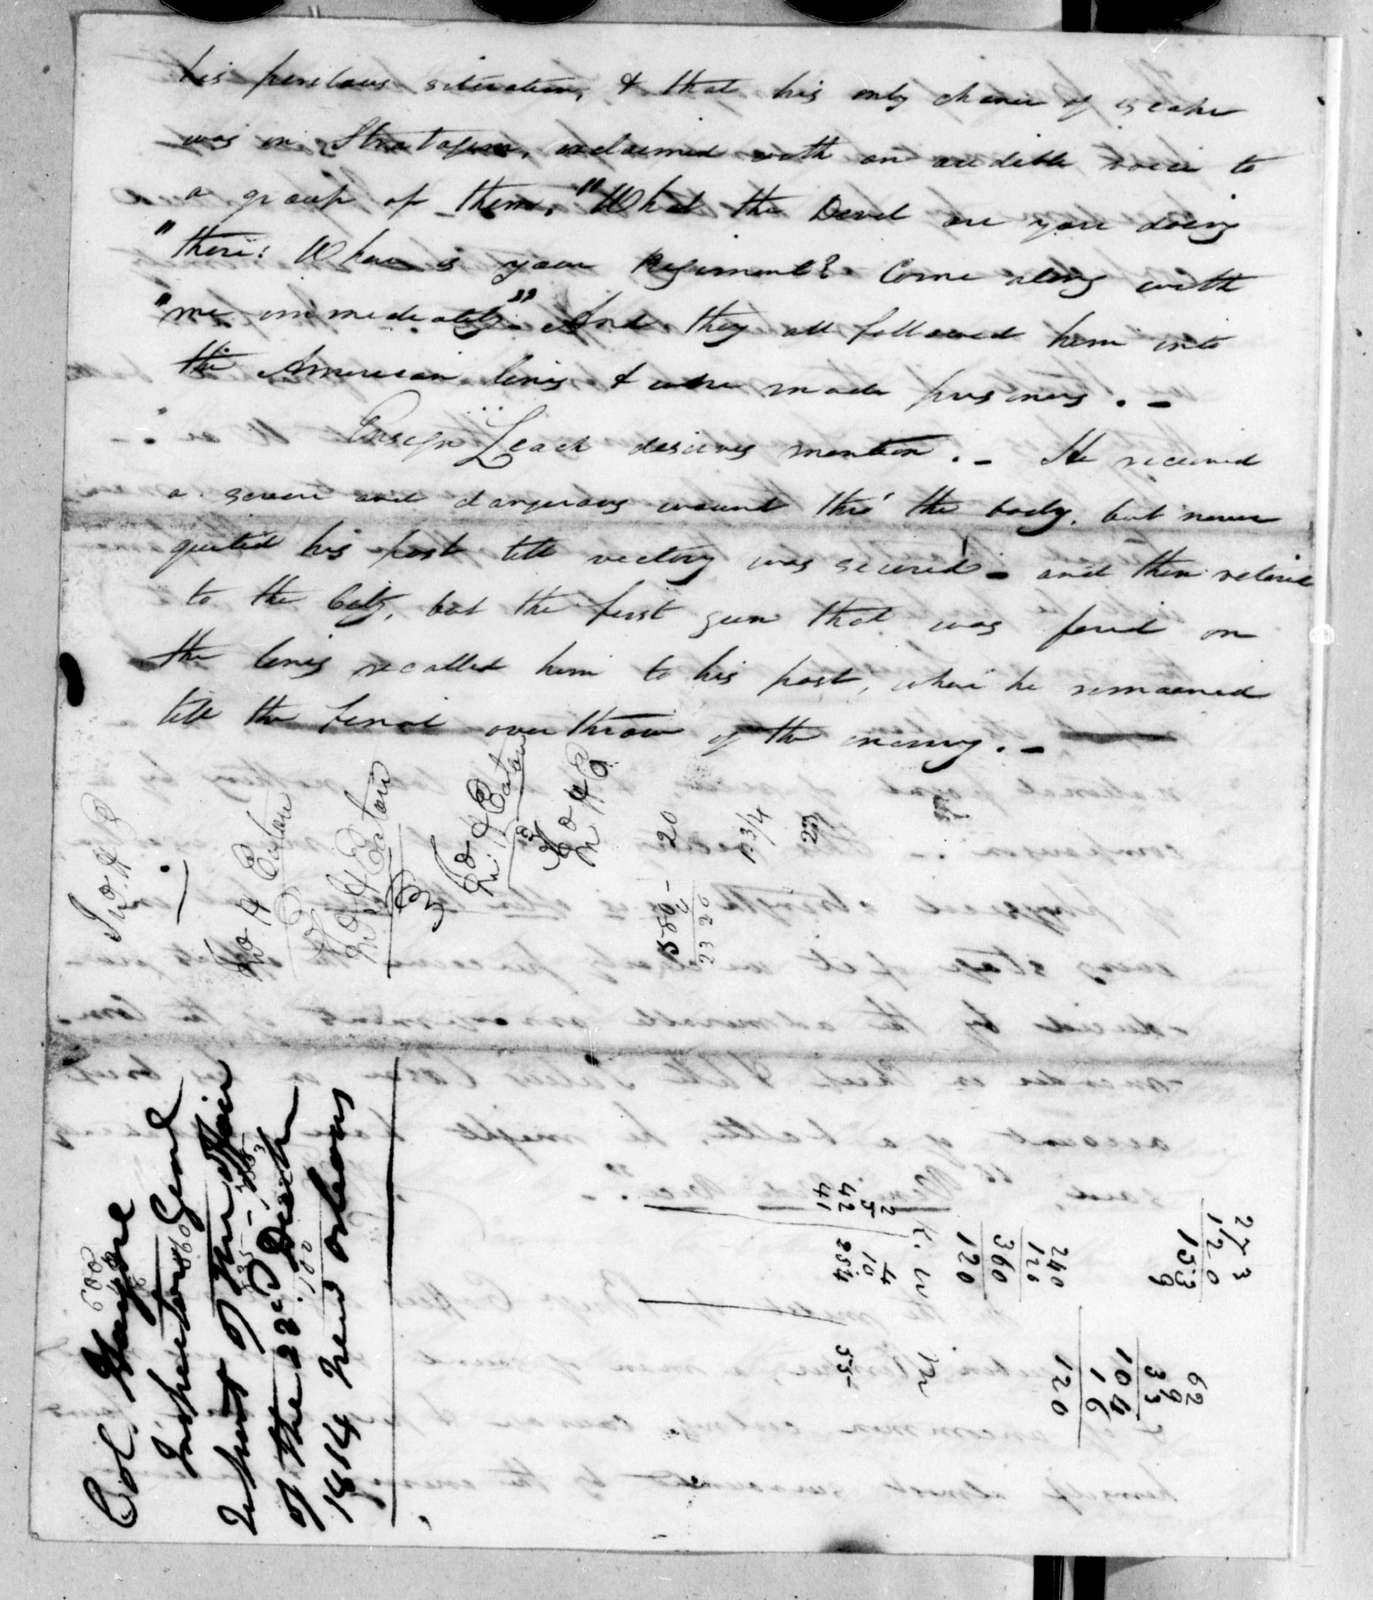 Arthur Peronneau Hayne, December 23, 1814